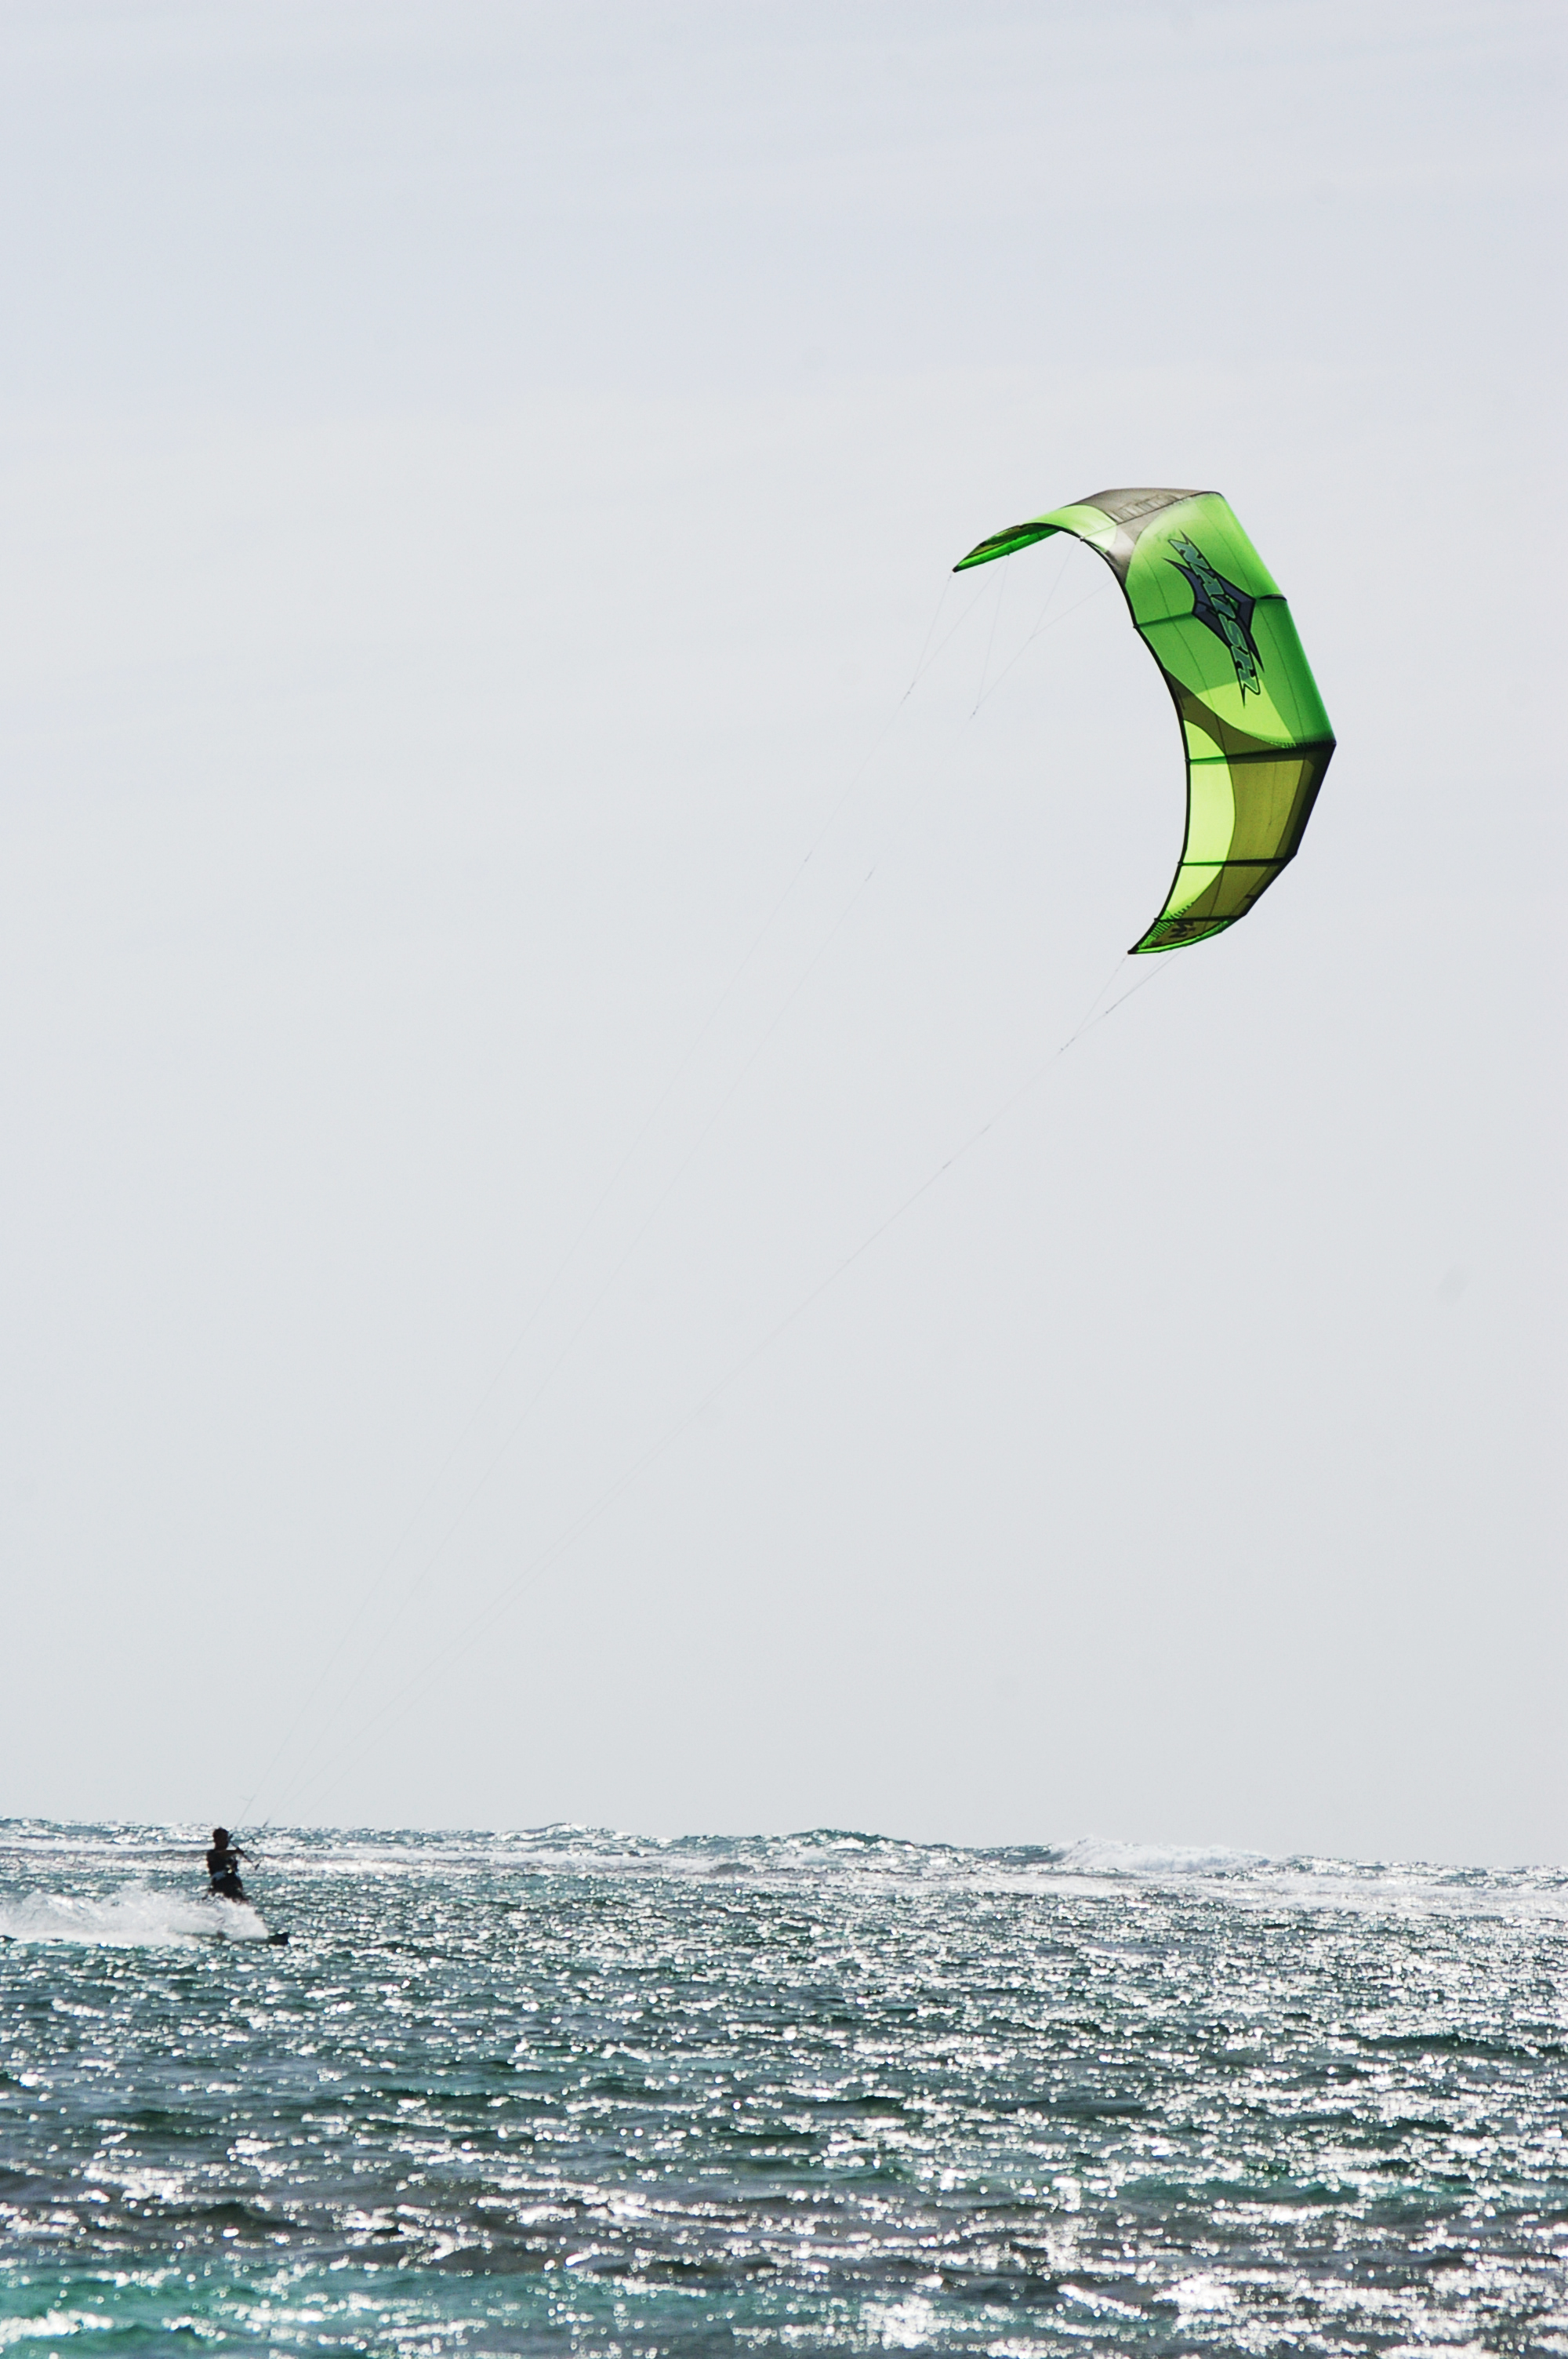 Kite surfing, Aqua, Attraction, Extreme, Fast, HQ Photo